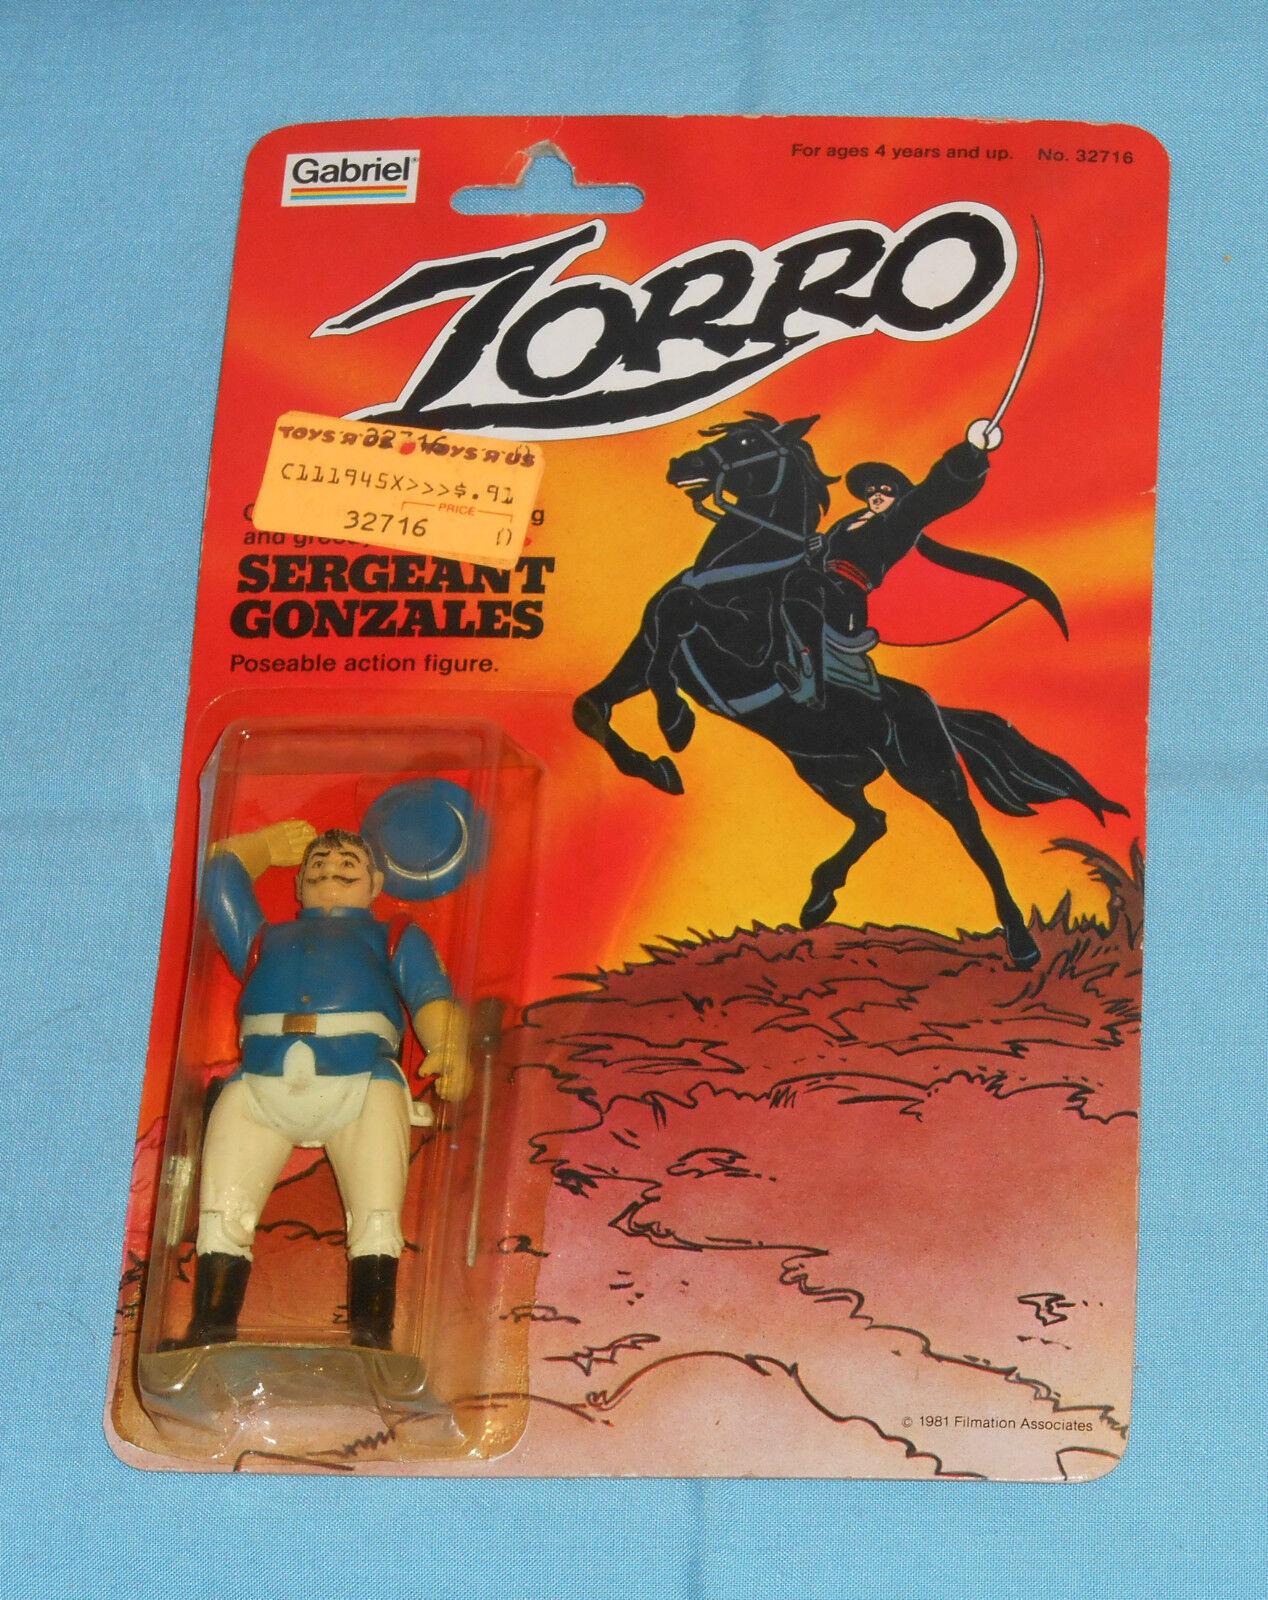 Vintage Gabriel Zorro SERGEANT GONZALES MOC